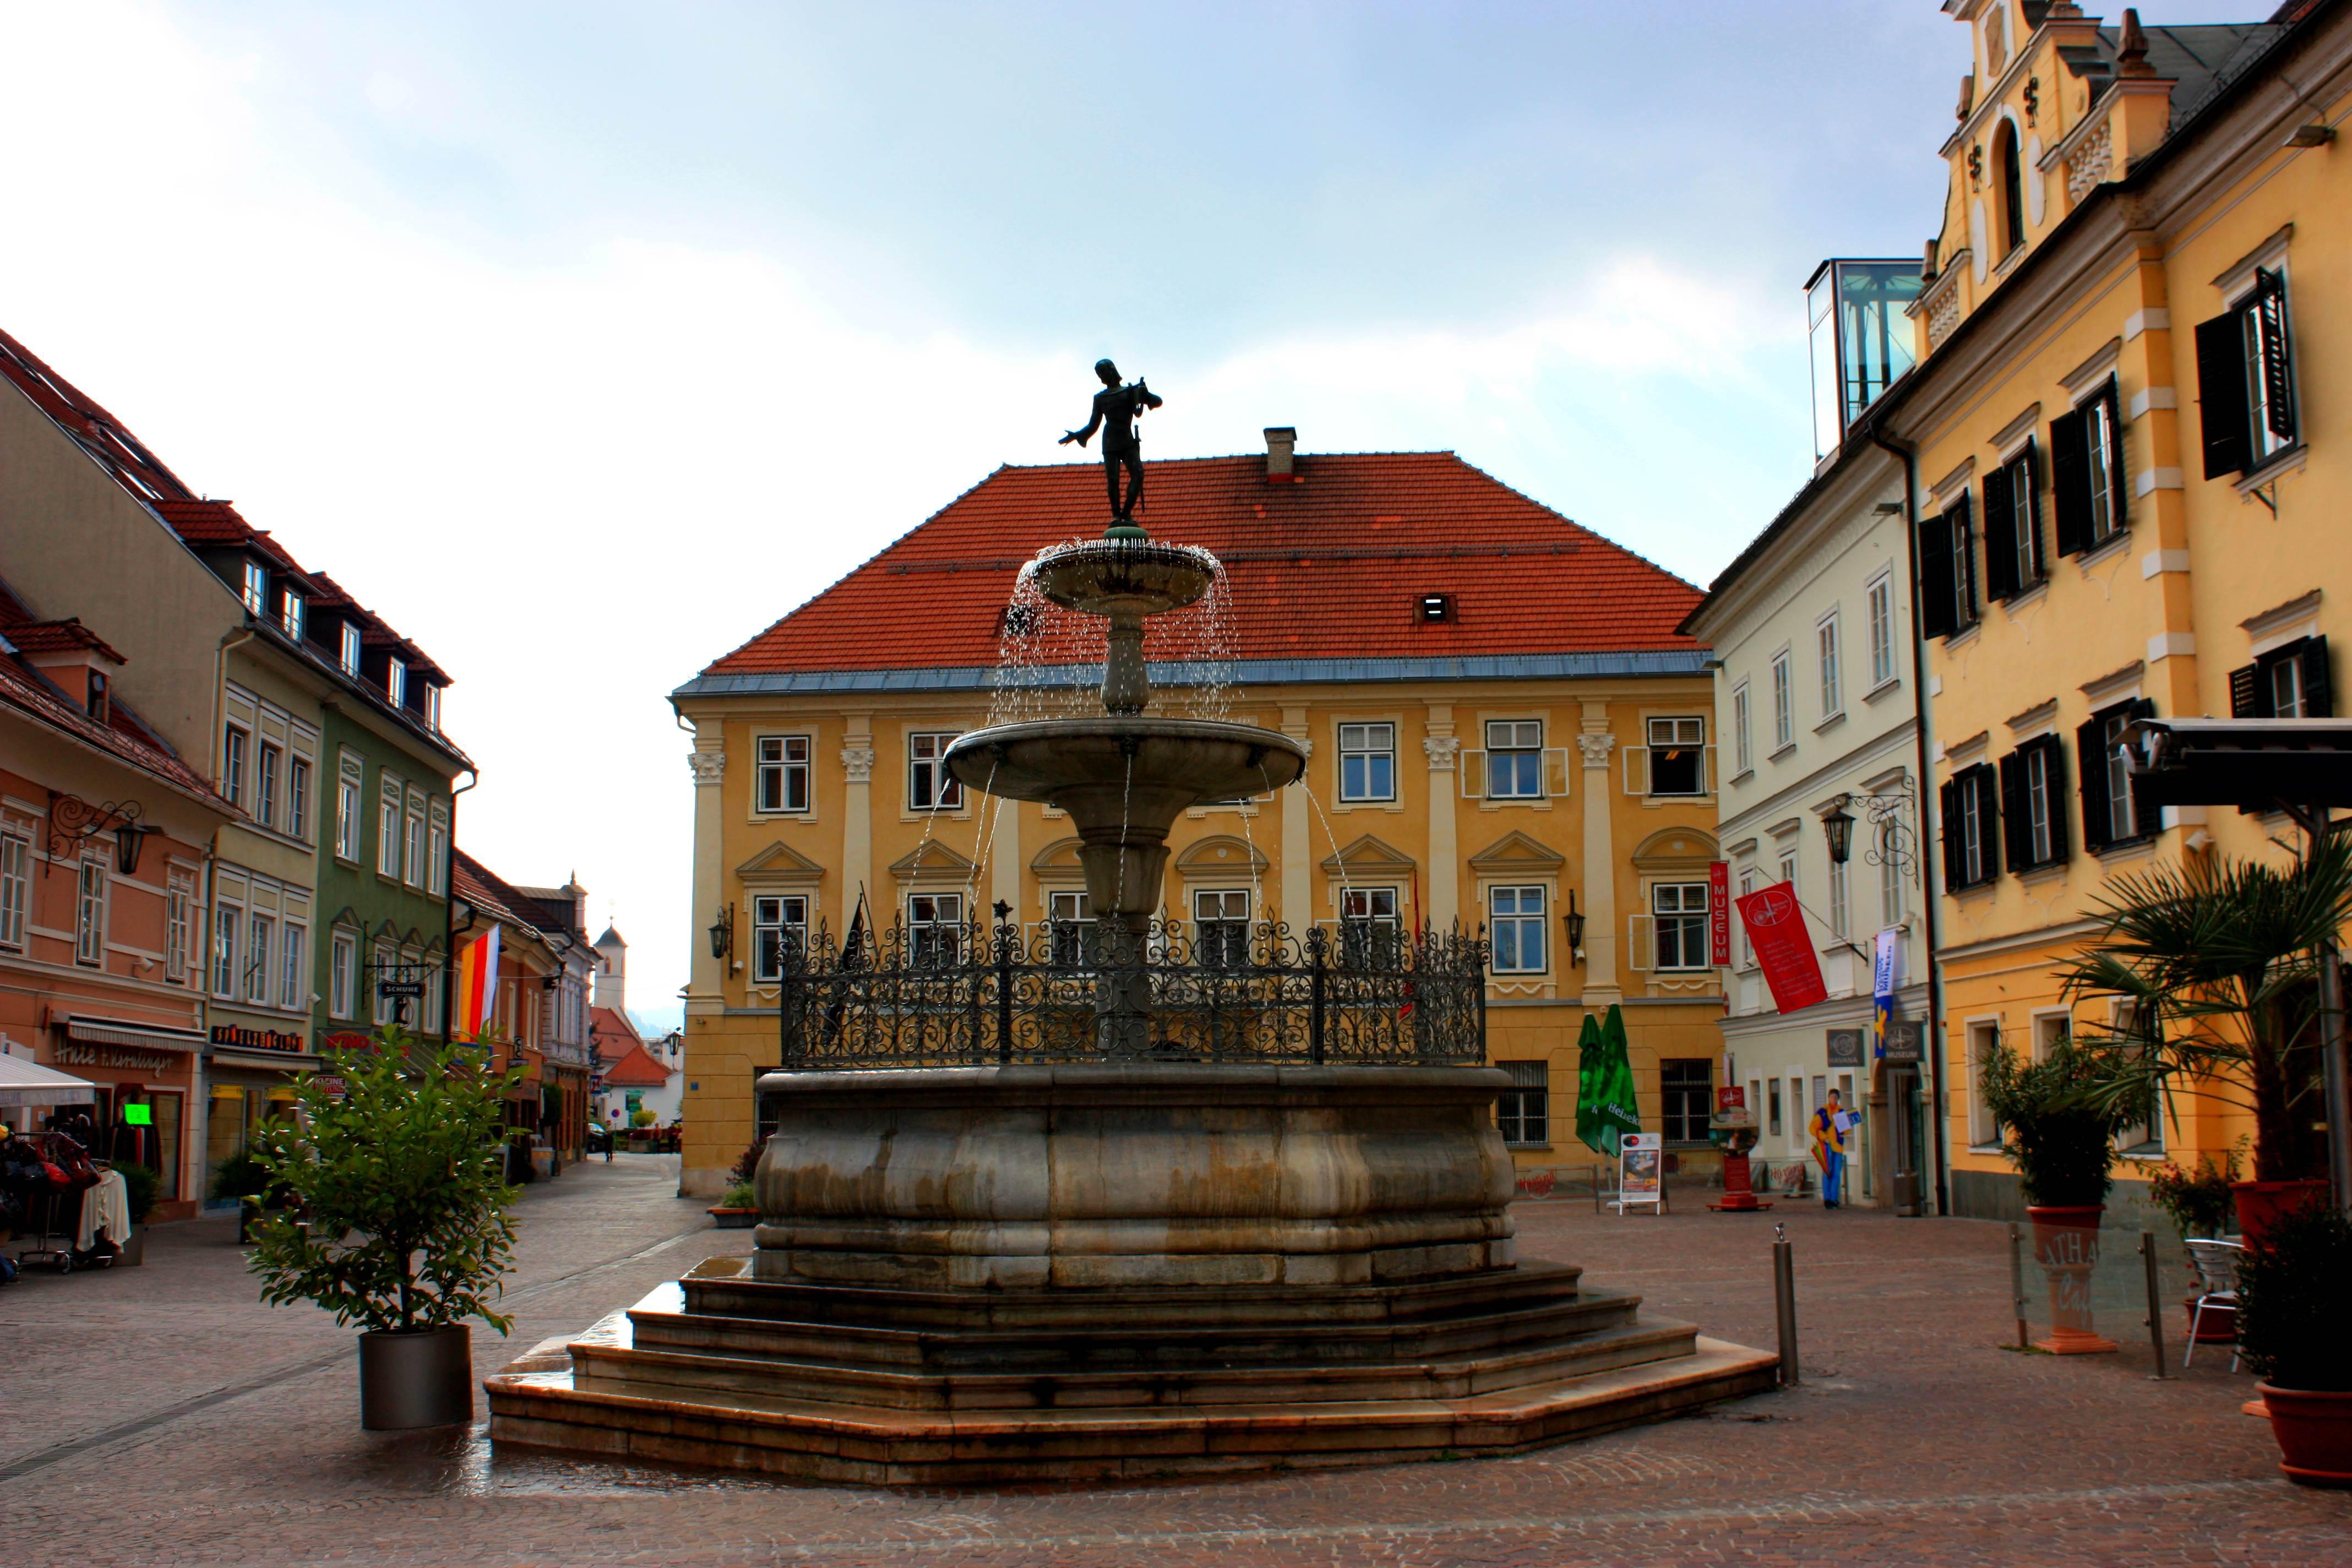 Отдых в Австрии и Кремсе